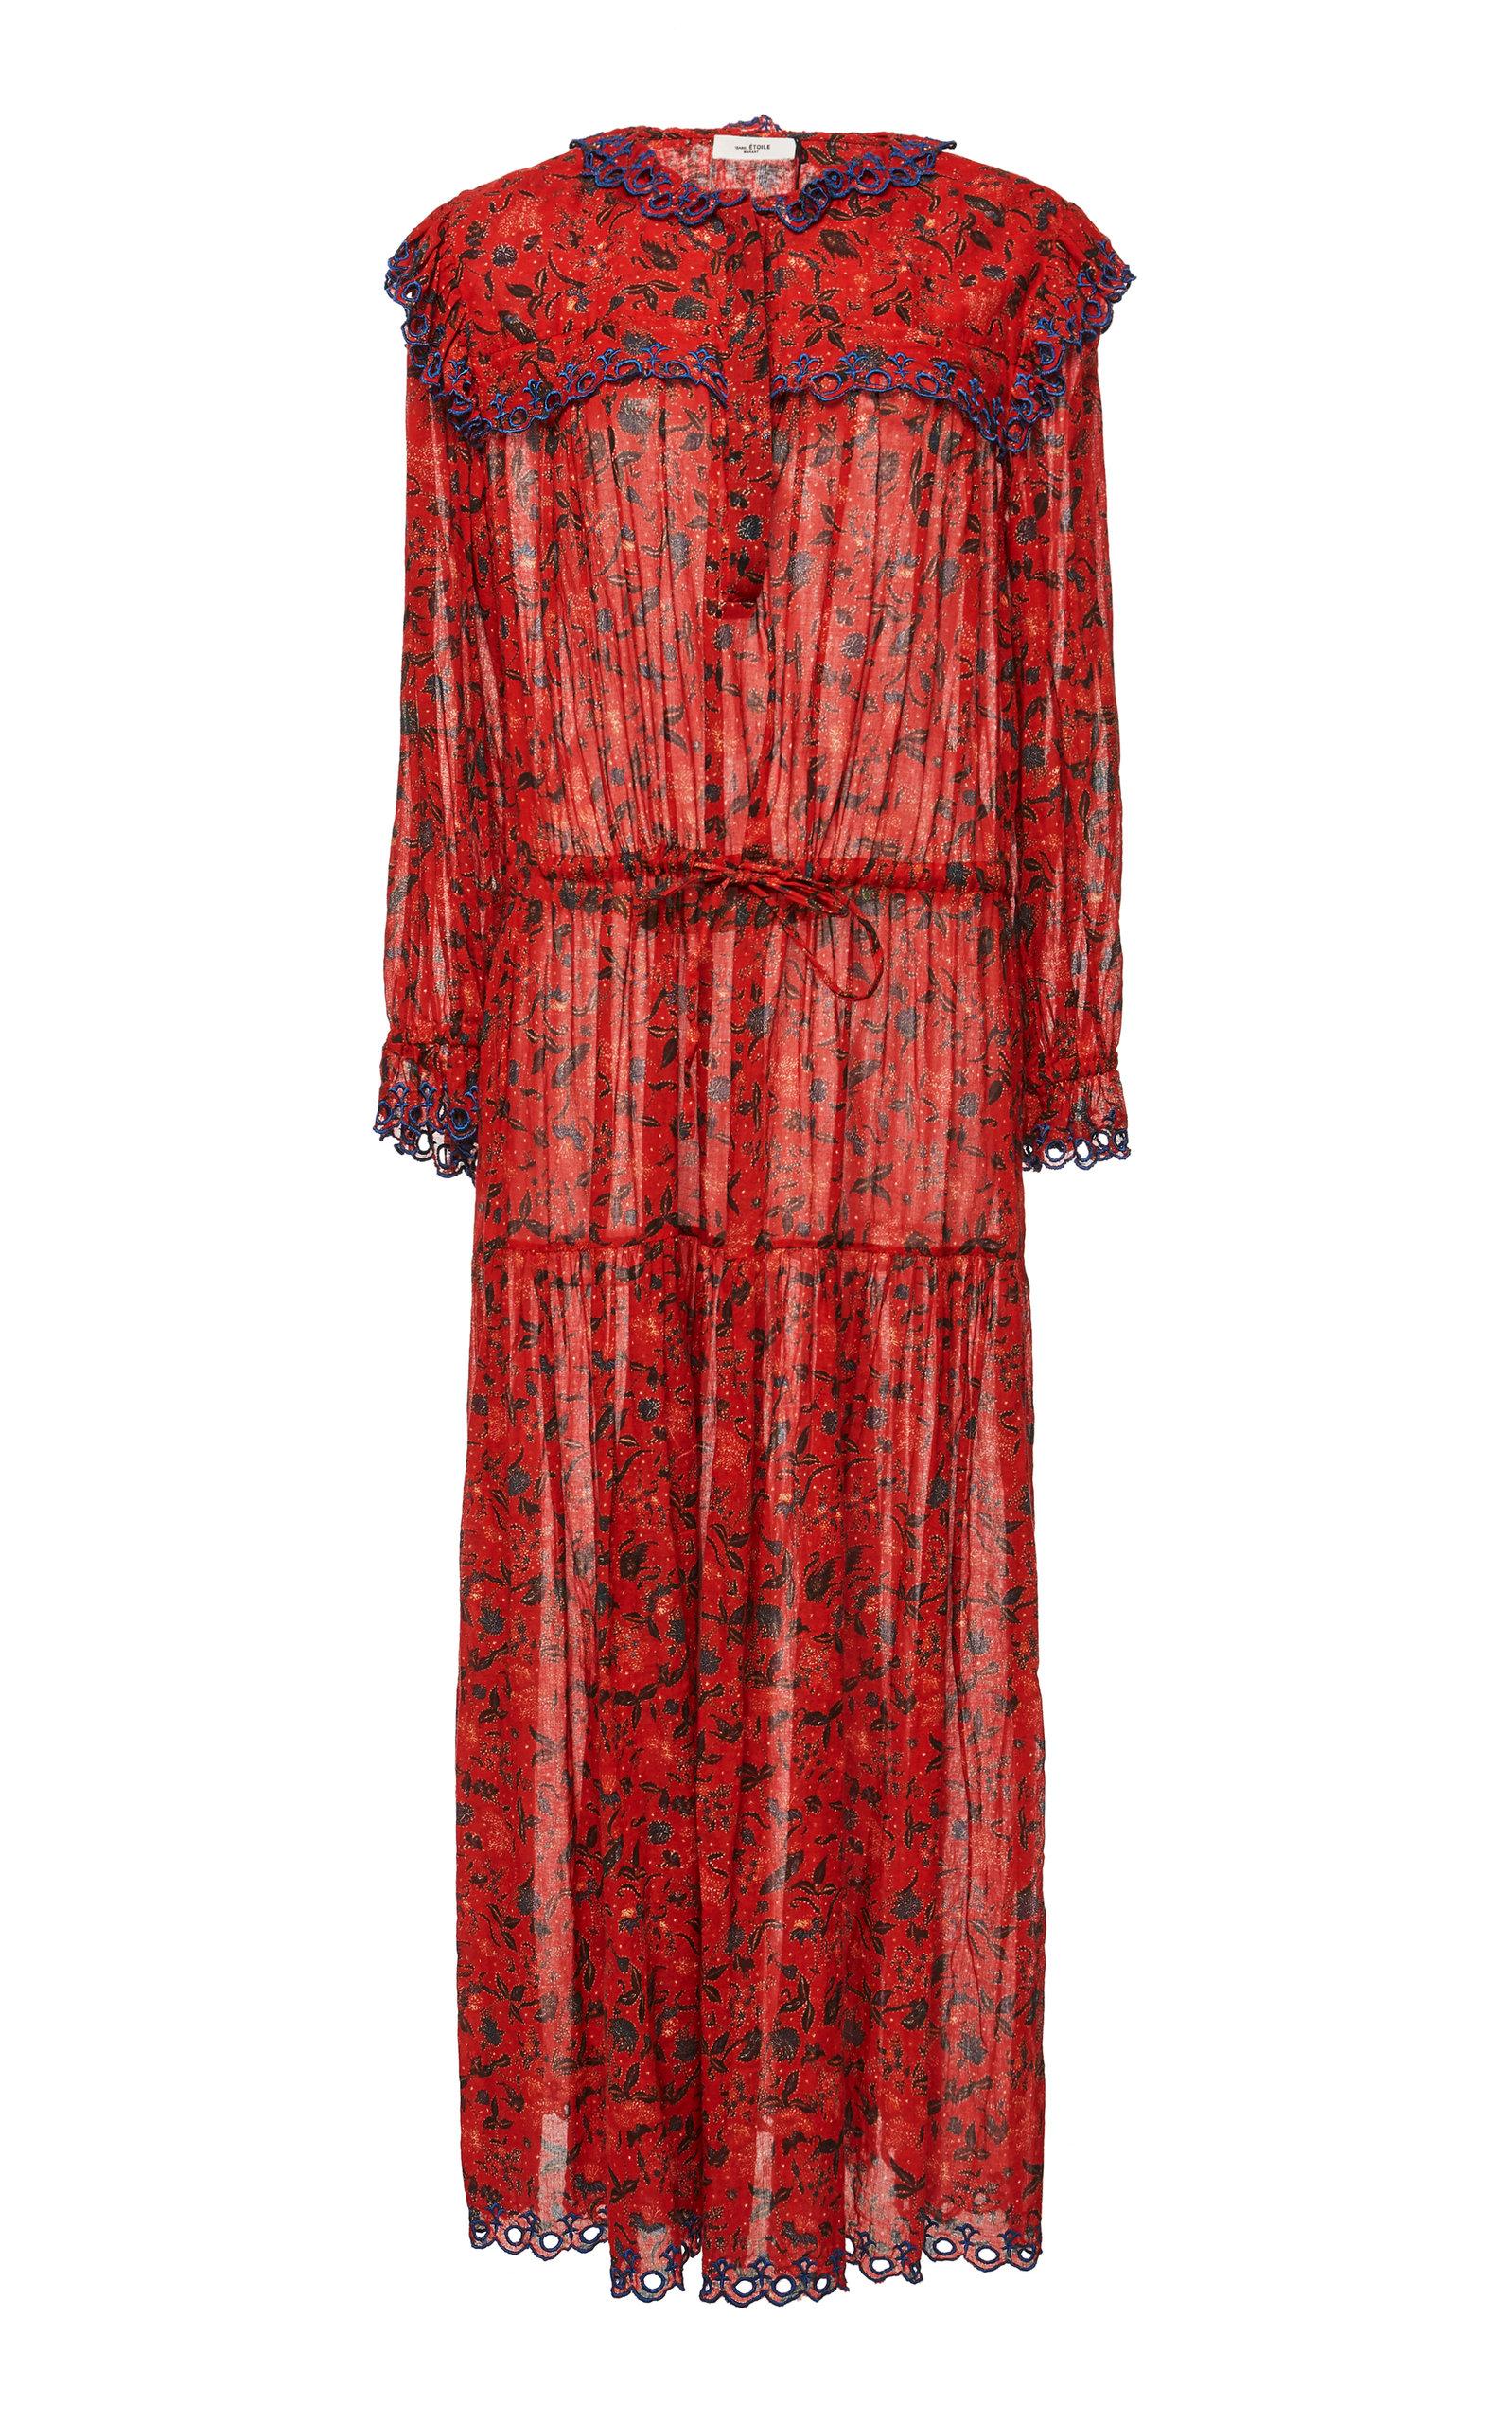 1e444b13a Isabel Marant ÉtoileEina Ruffled Floral-Print Cotton-Voile Maxi Dress.  CLOSE. Loading